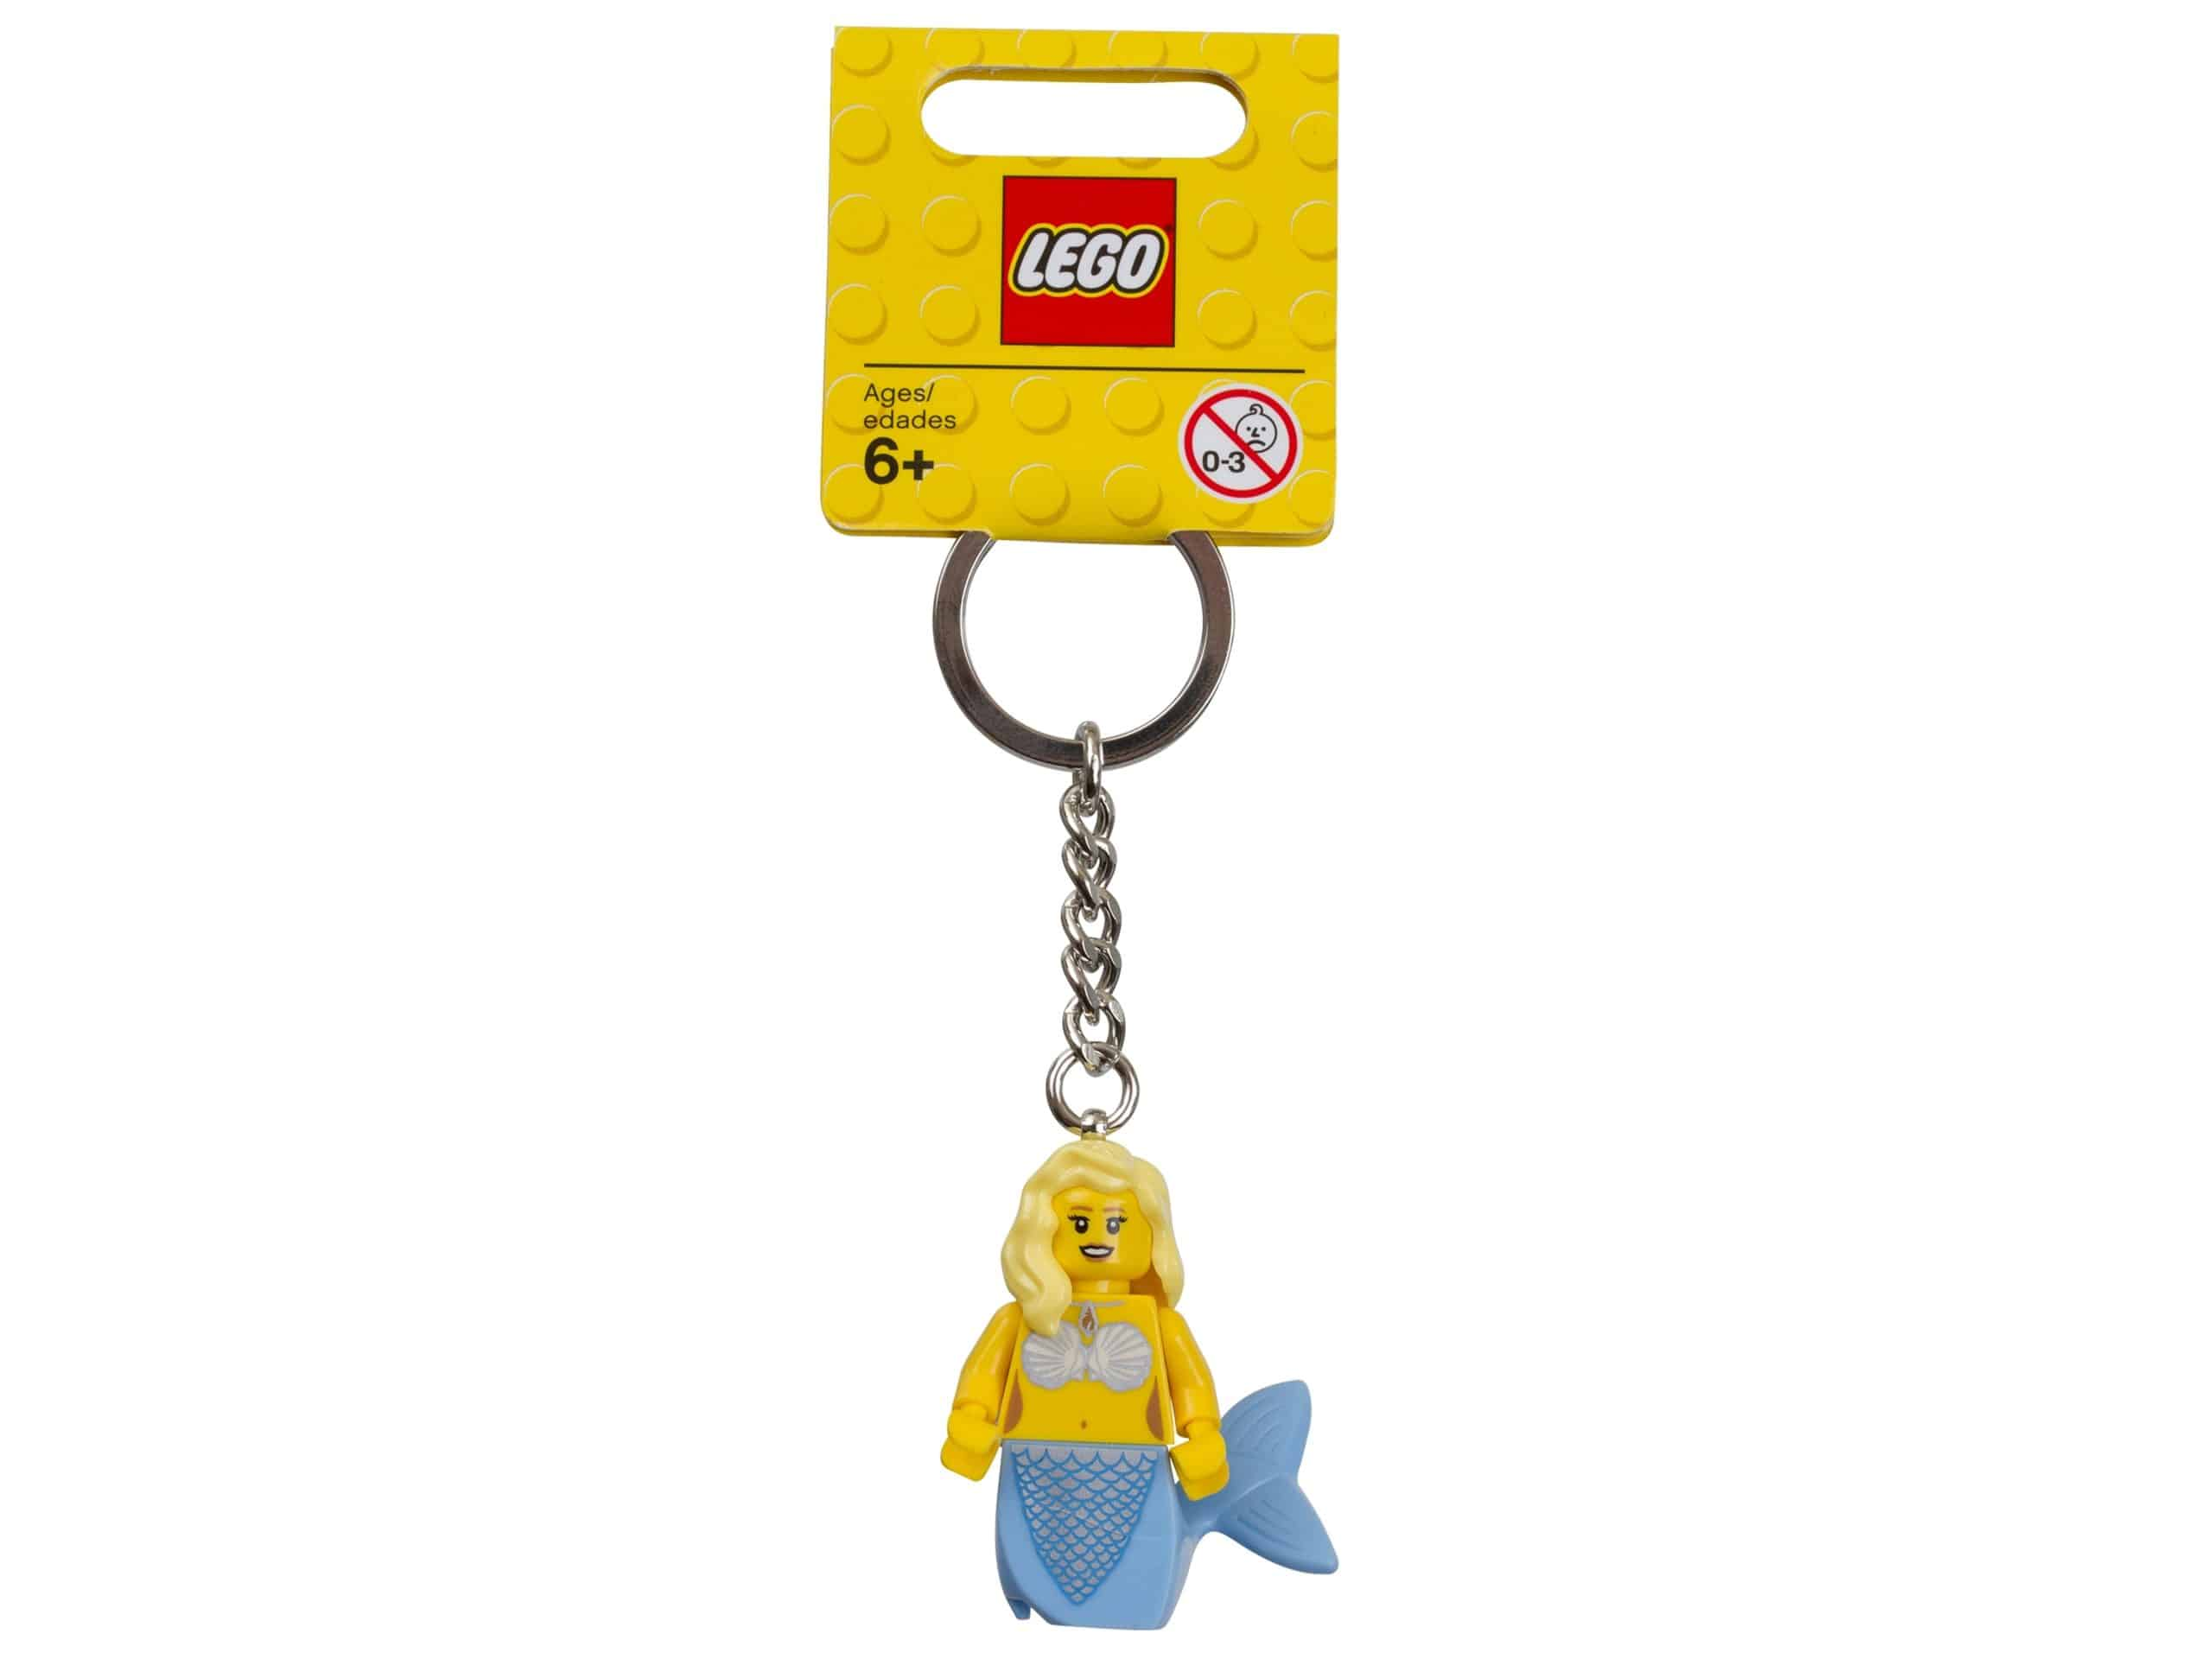 lego 851393 meerjungfrau schlusselanhanger scaled